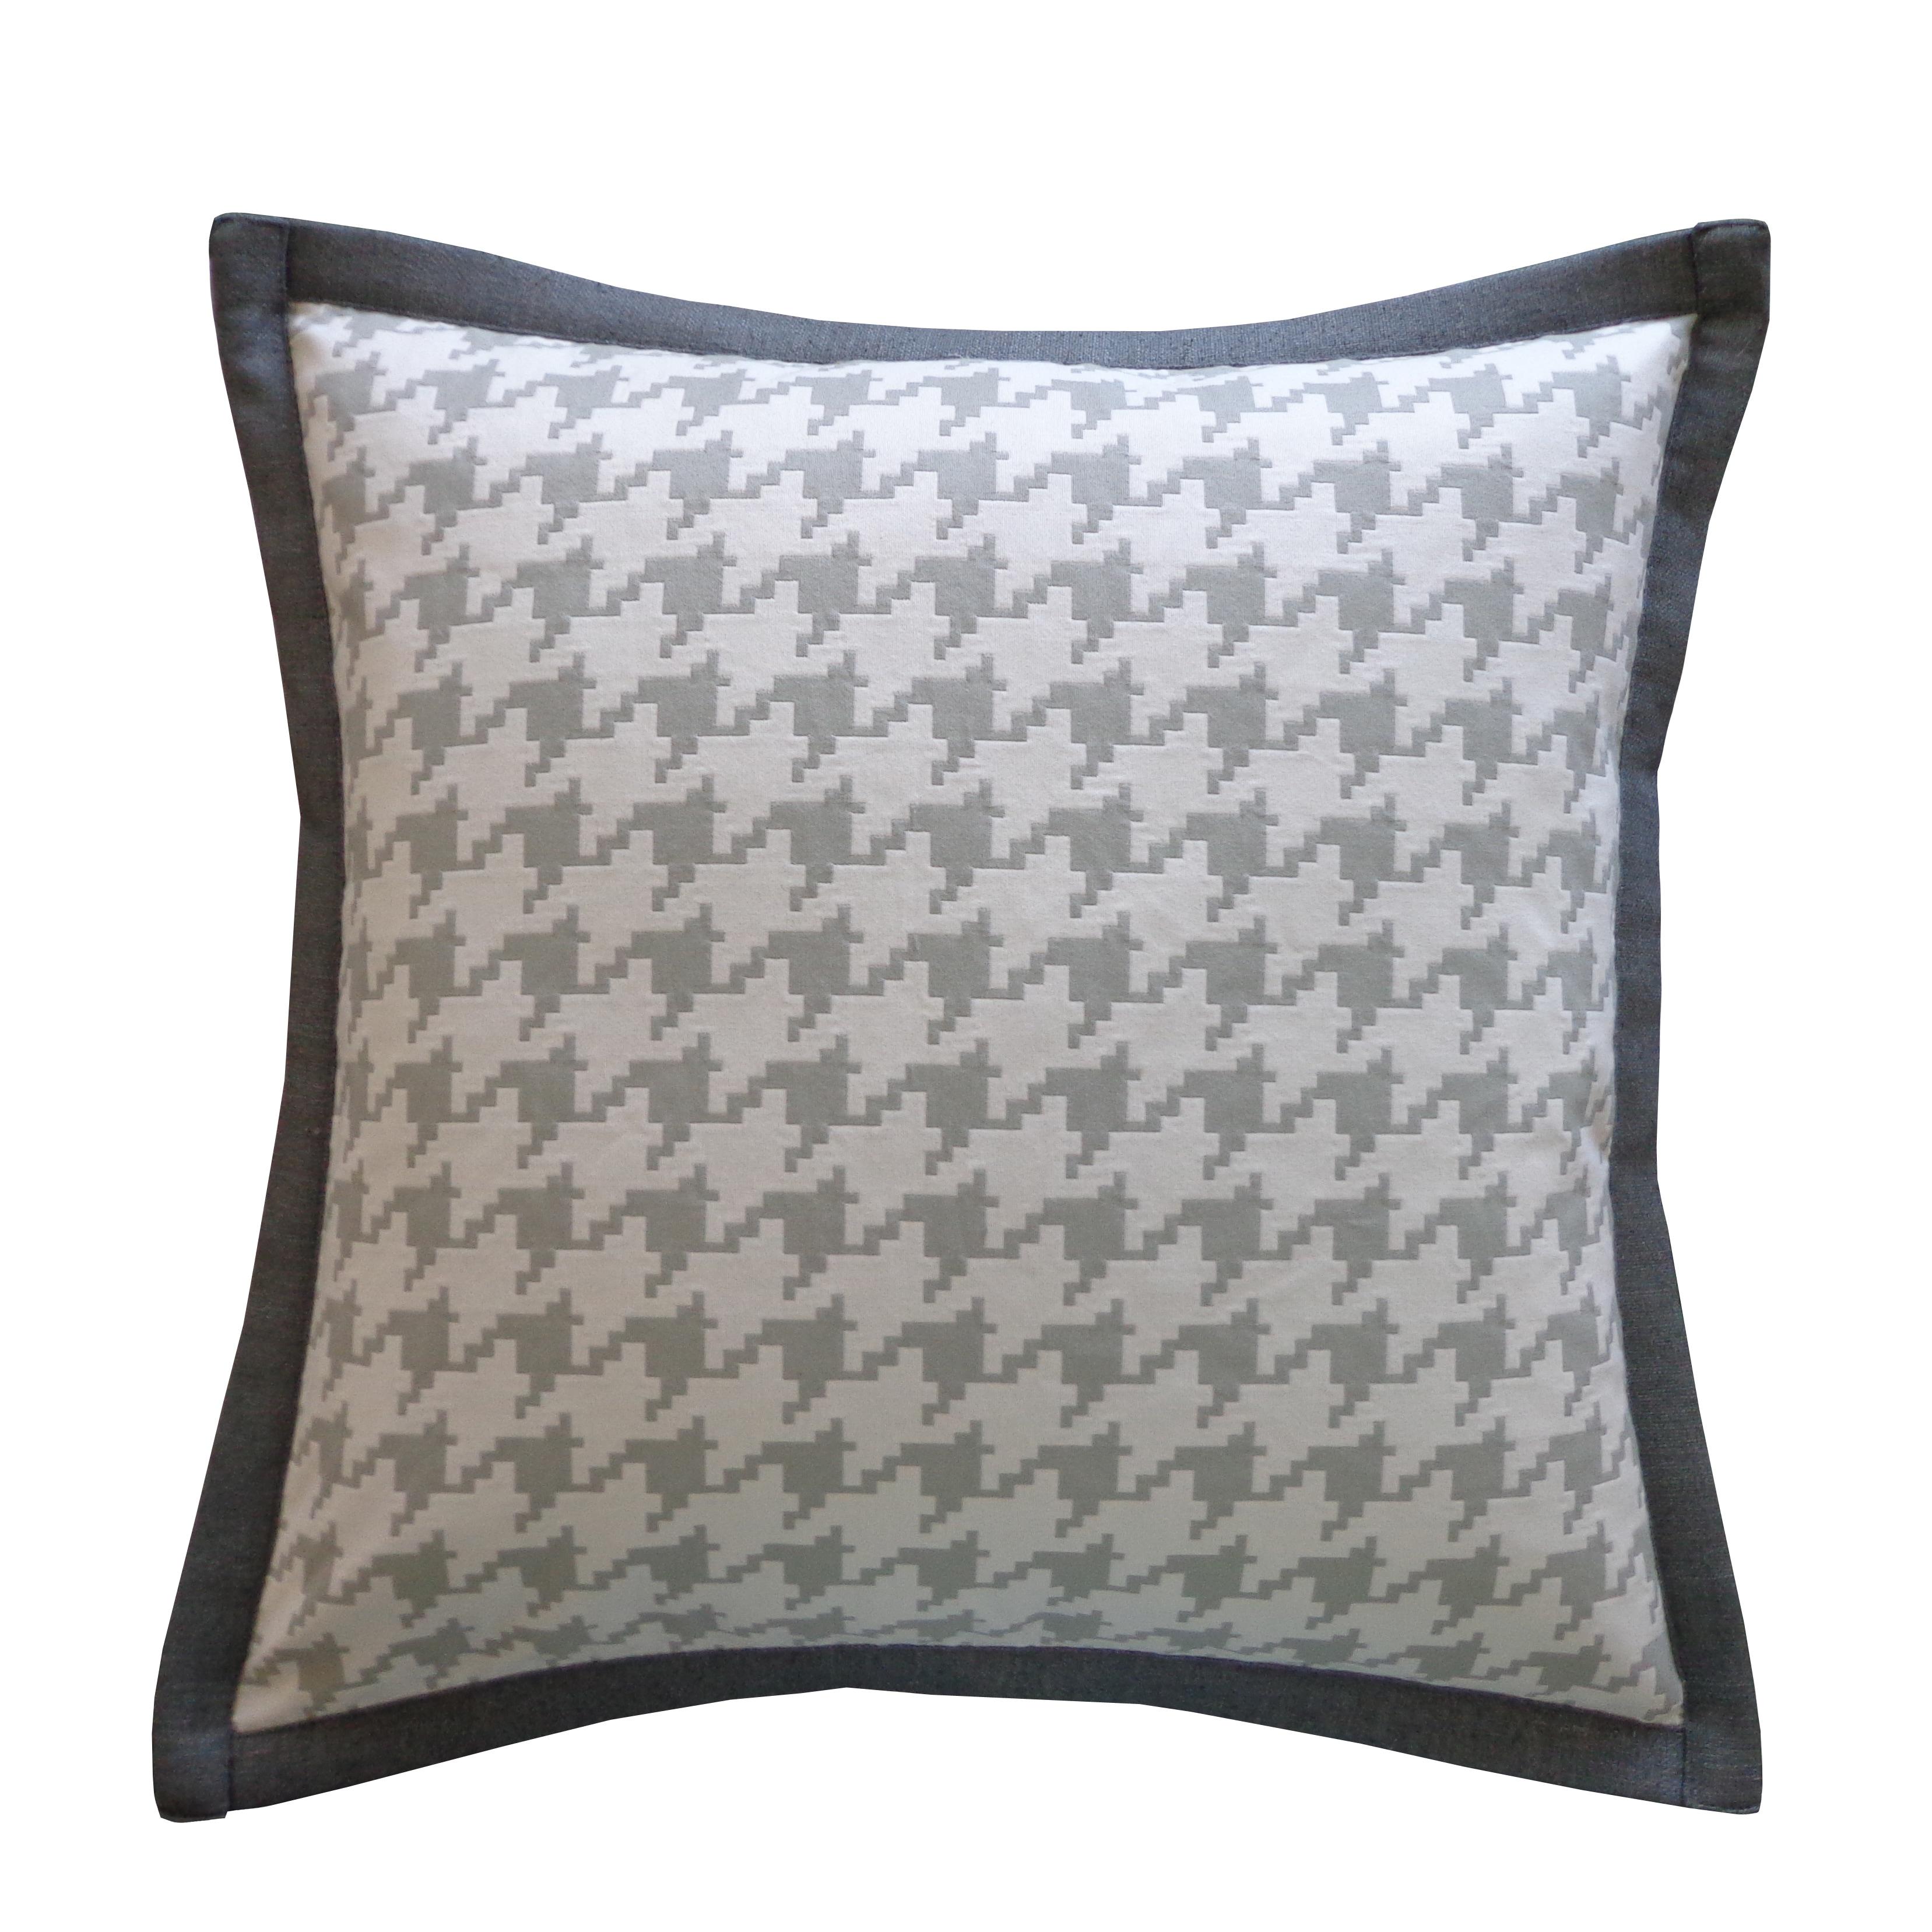 Handmade Houndstooth Gray Cotton Pillow Overstock 9480152